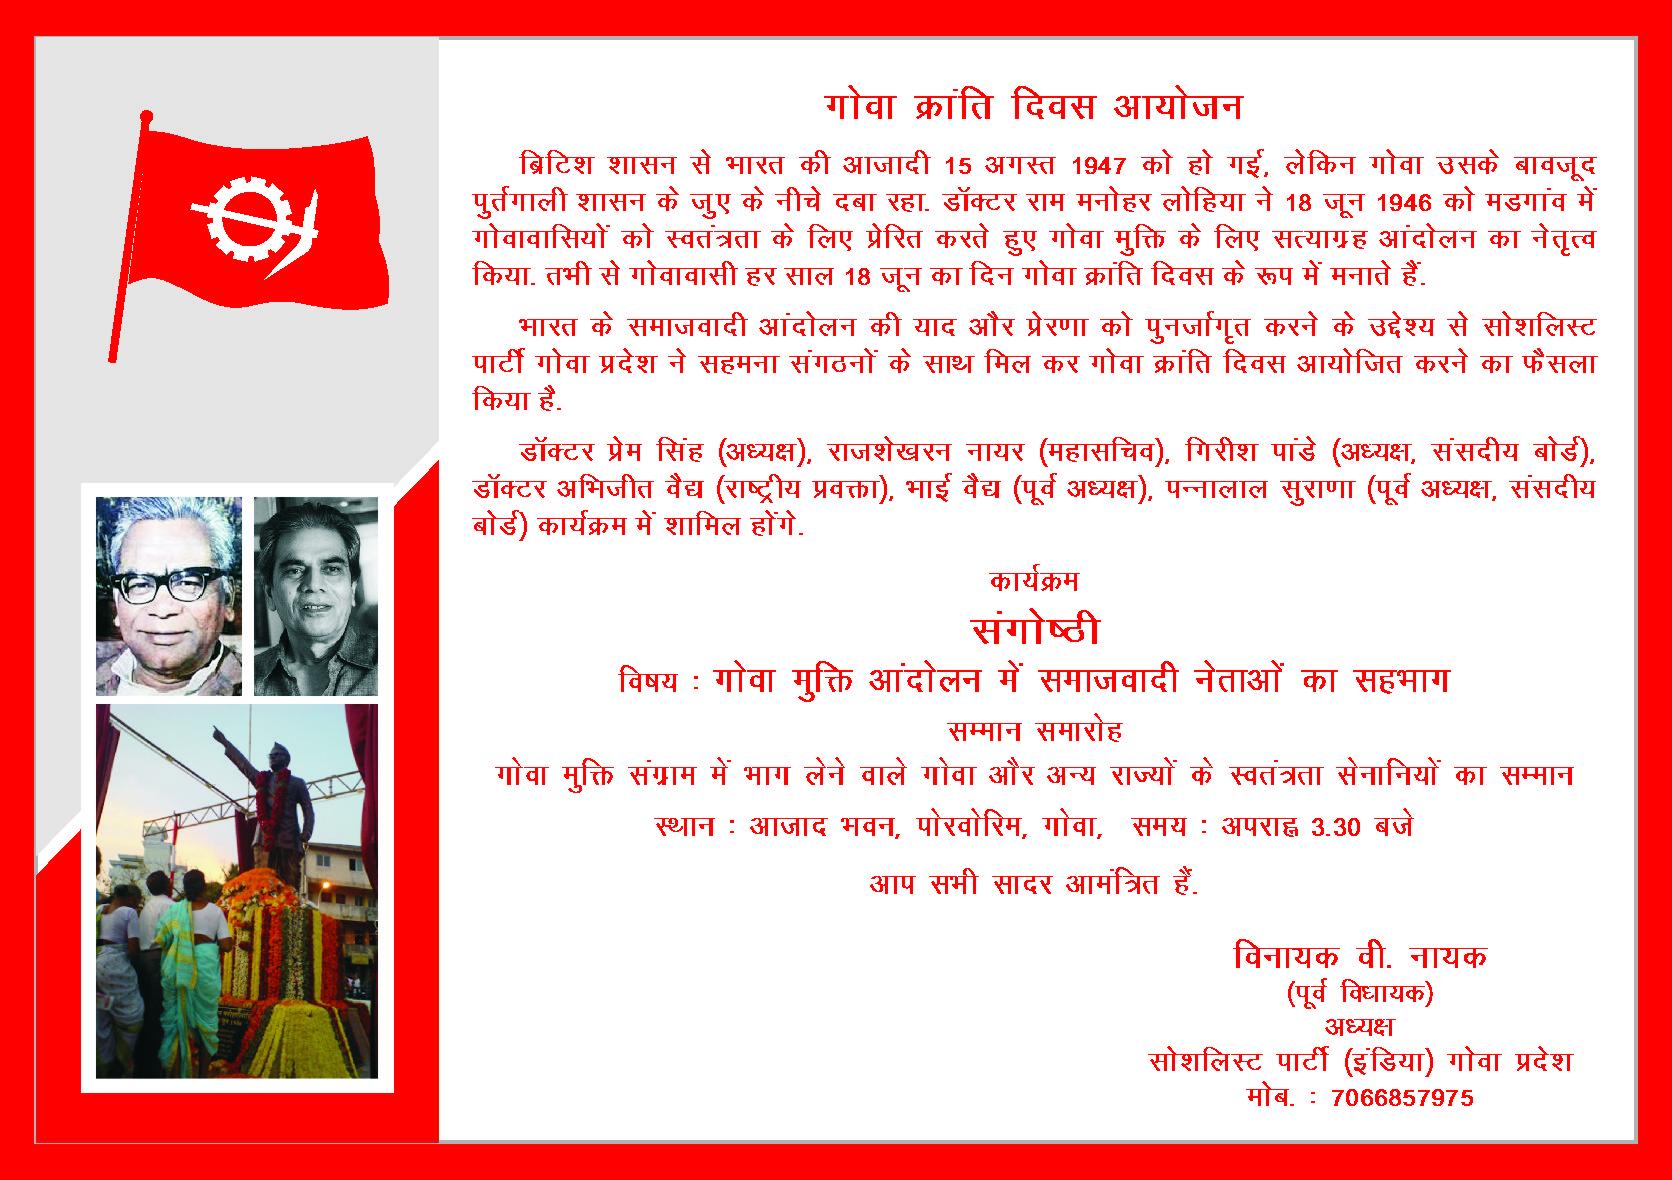 Goa Revolution Day Celebration